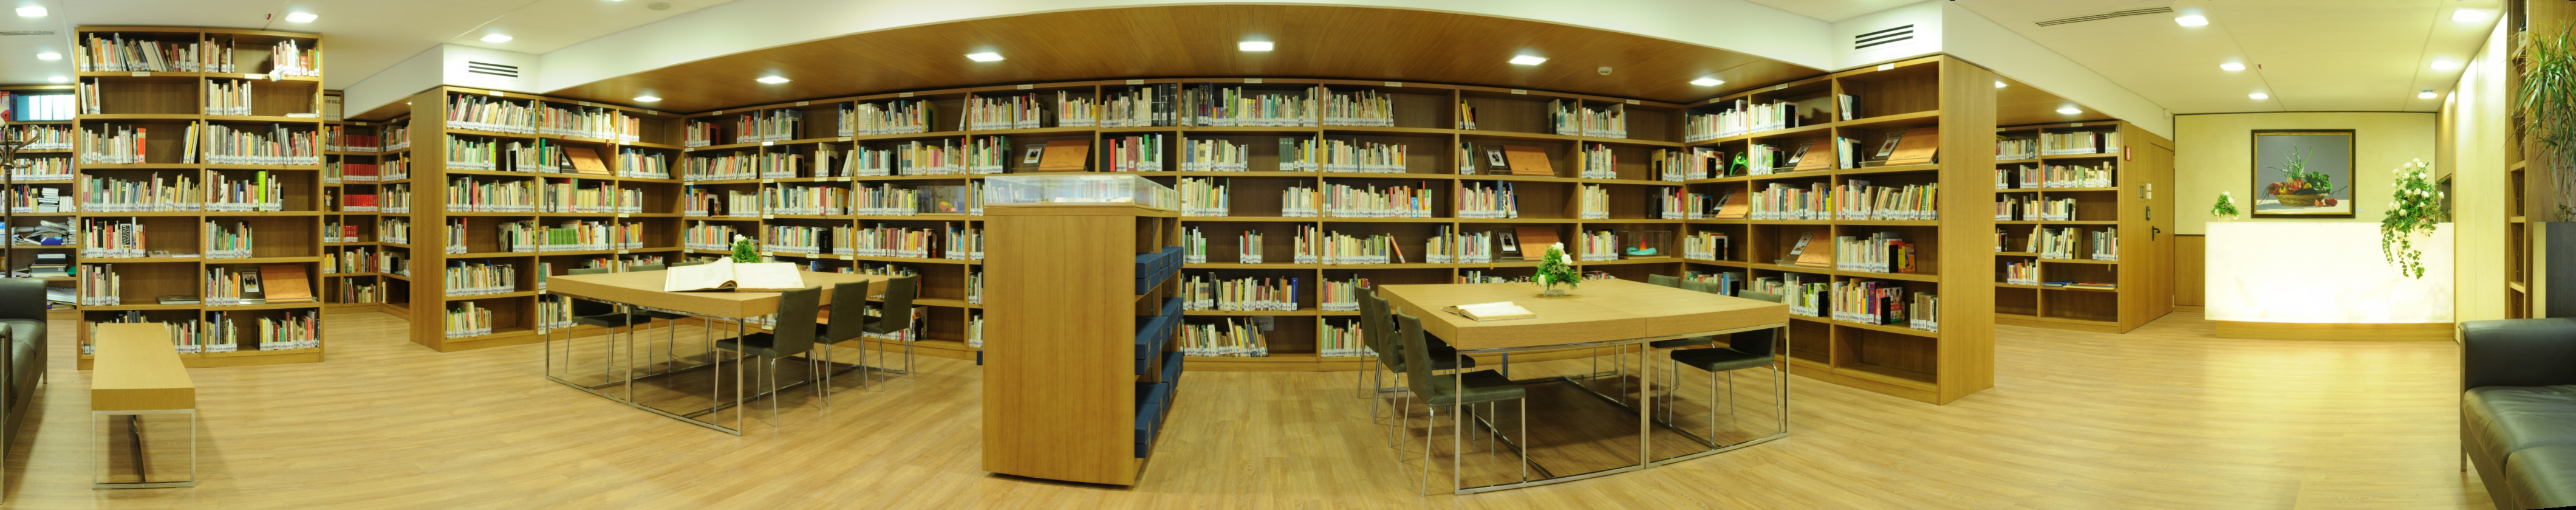 Biblioteca Gastronomica Academia Barilla